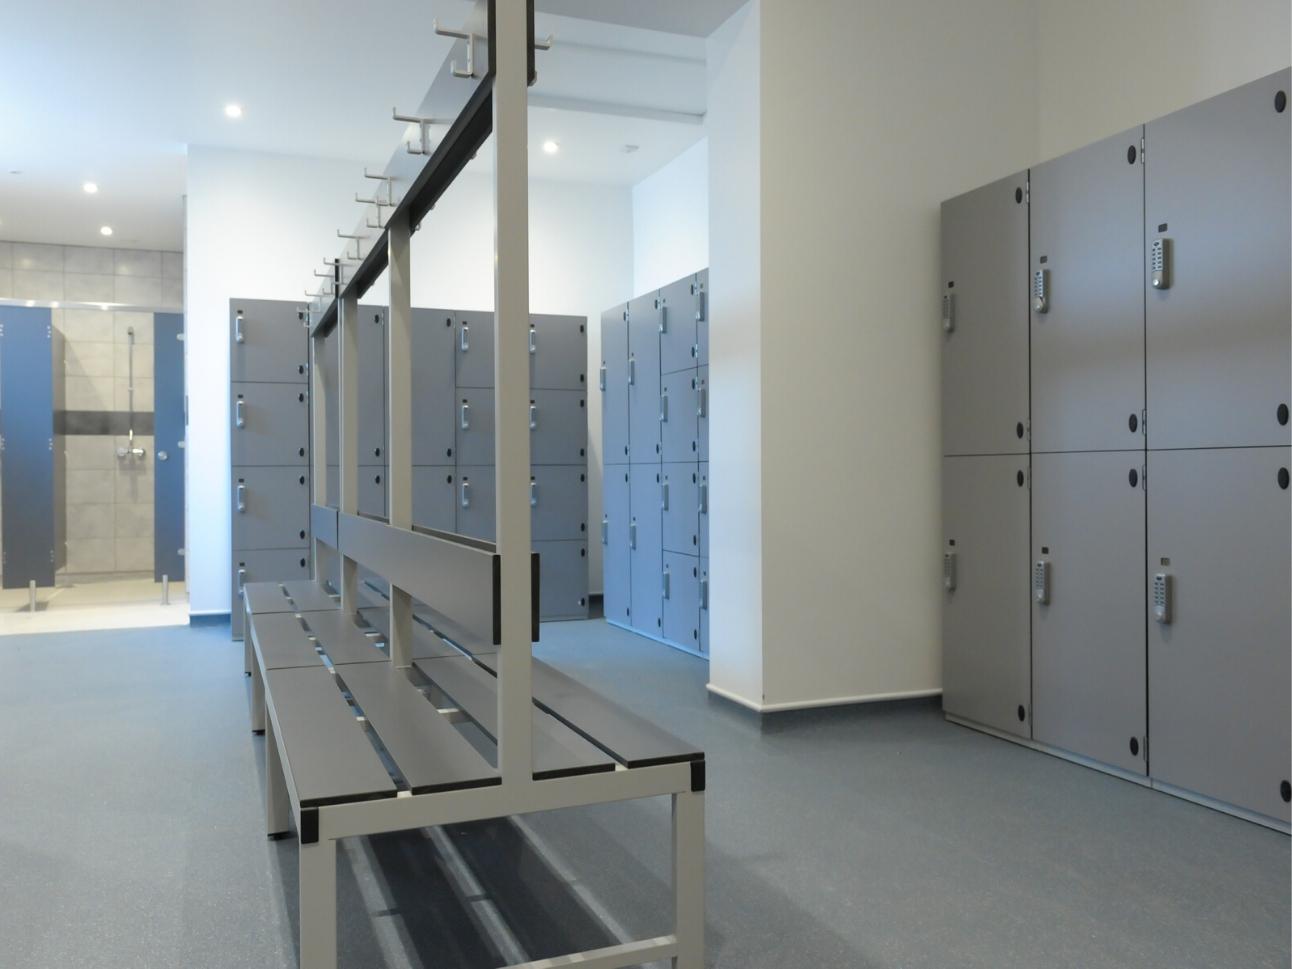 Wexham Park Golf Centre Washroom Refurbishment | Case Study | Commercial Washrooms